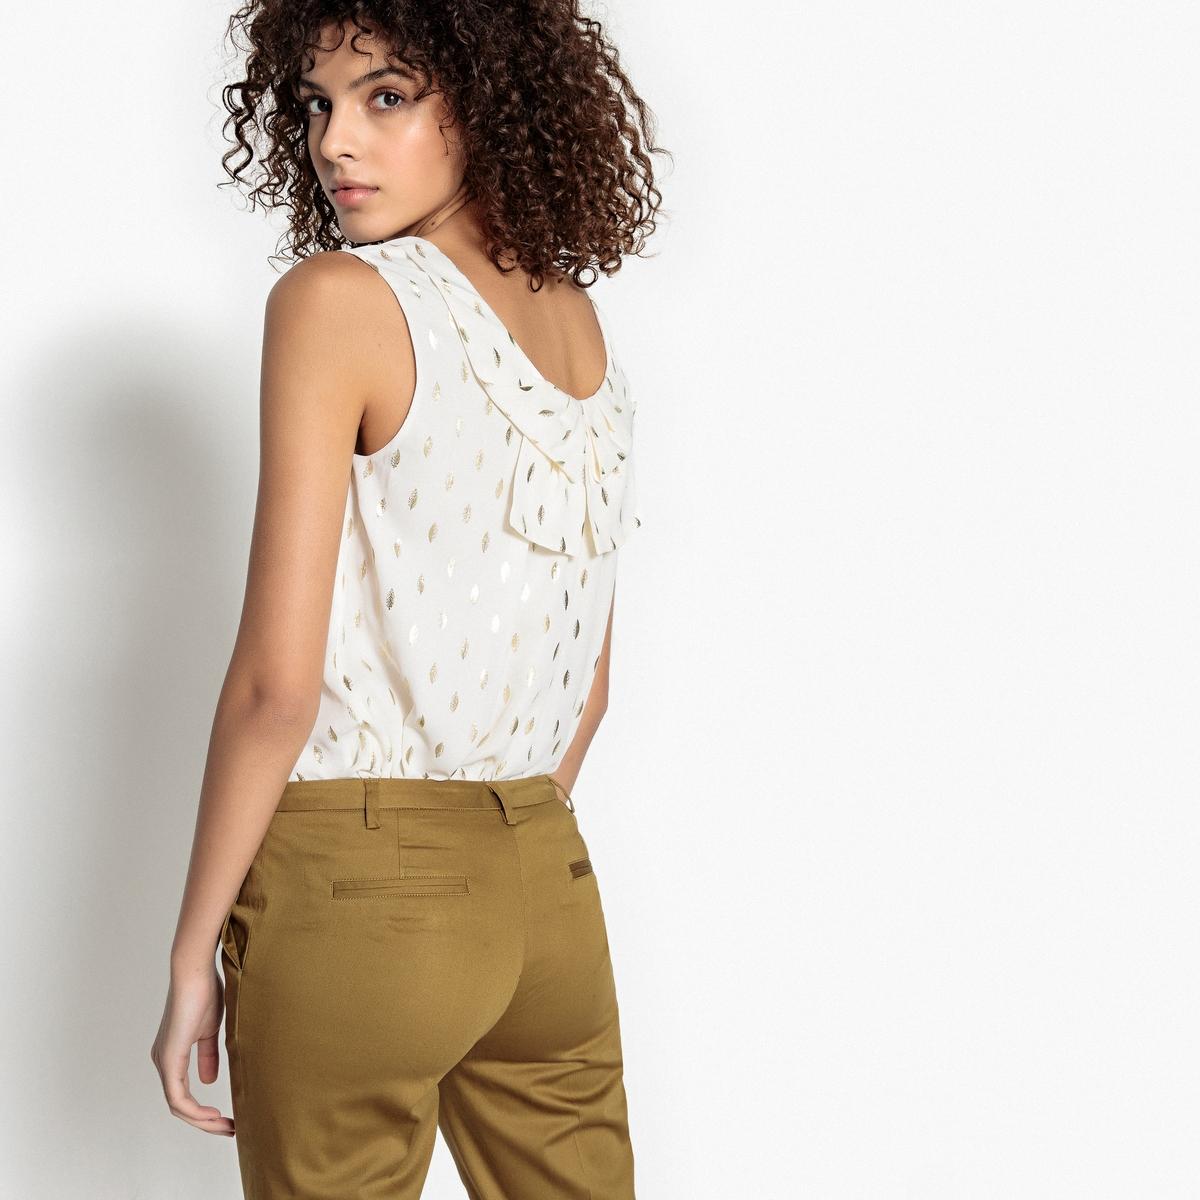 Блузка La Redoute С круглым вырезом и графическим рисунком без рукавов XS бежевый блузка с круглым вырезом графическим рисунком и длинными рукавами